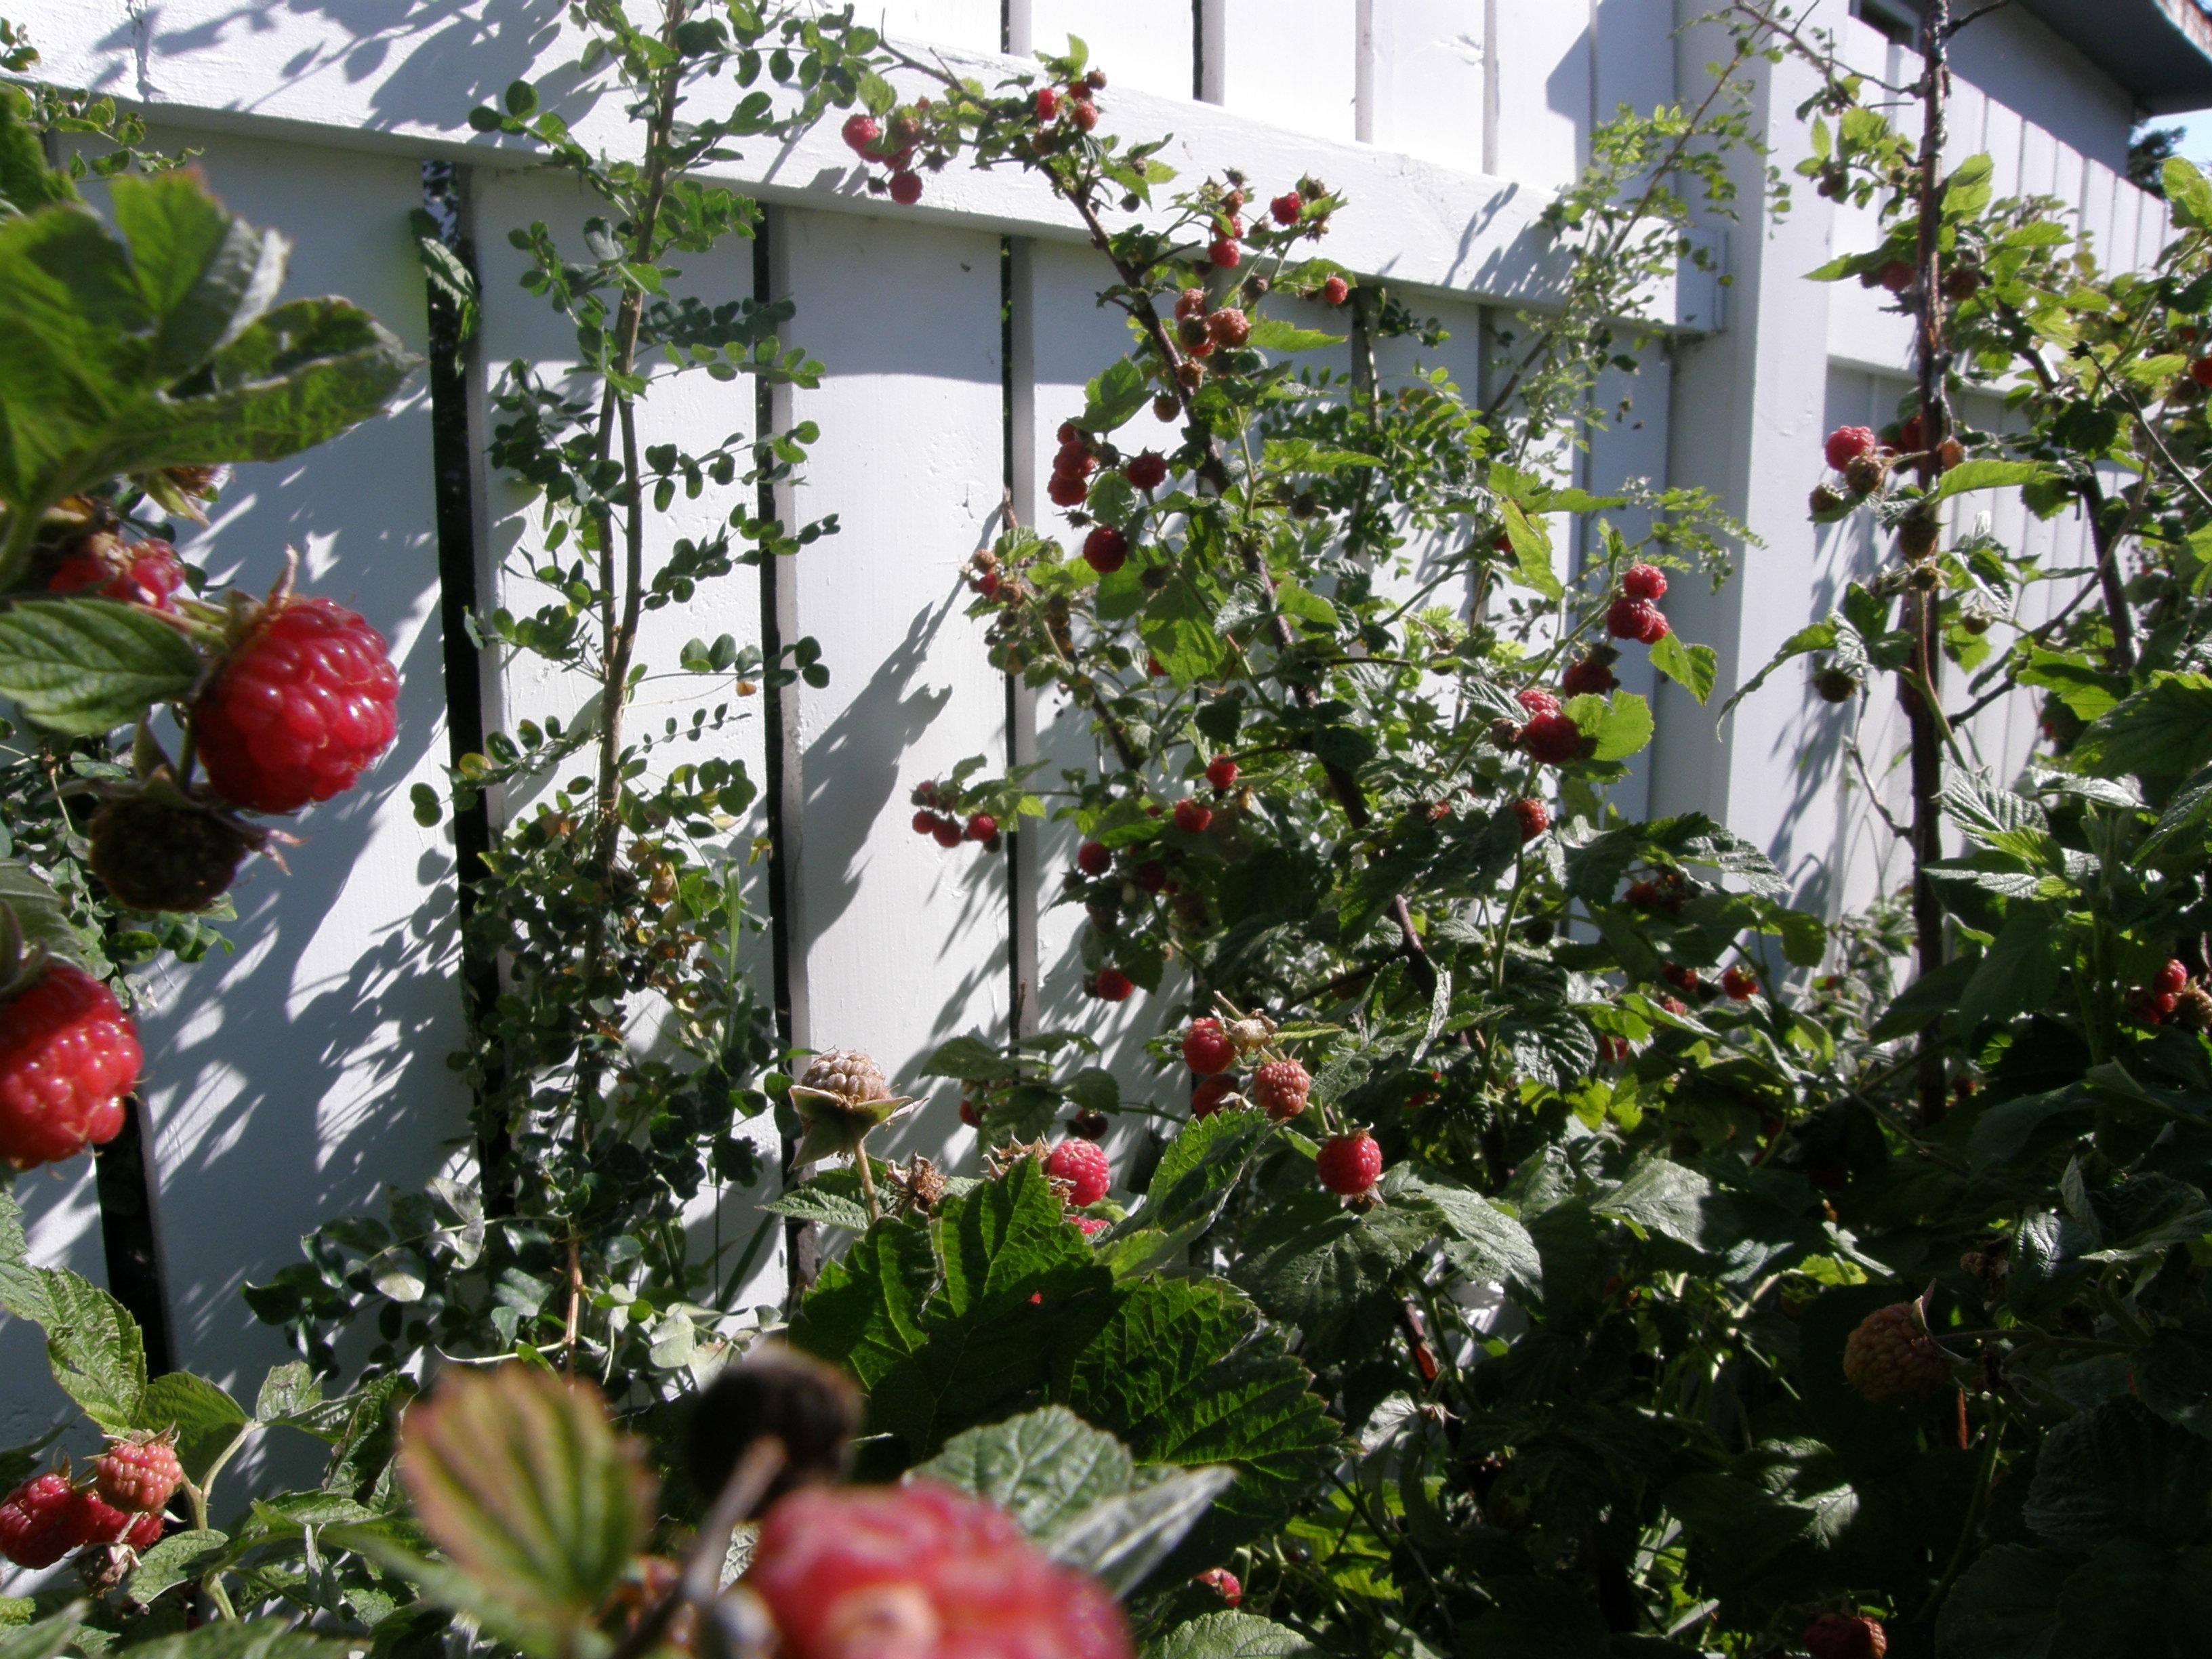 ripe raspberries in garden